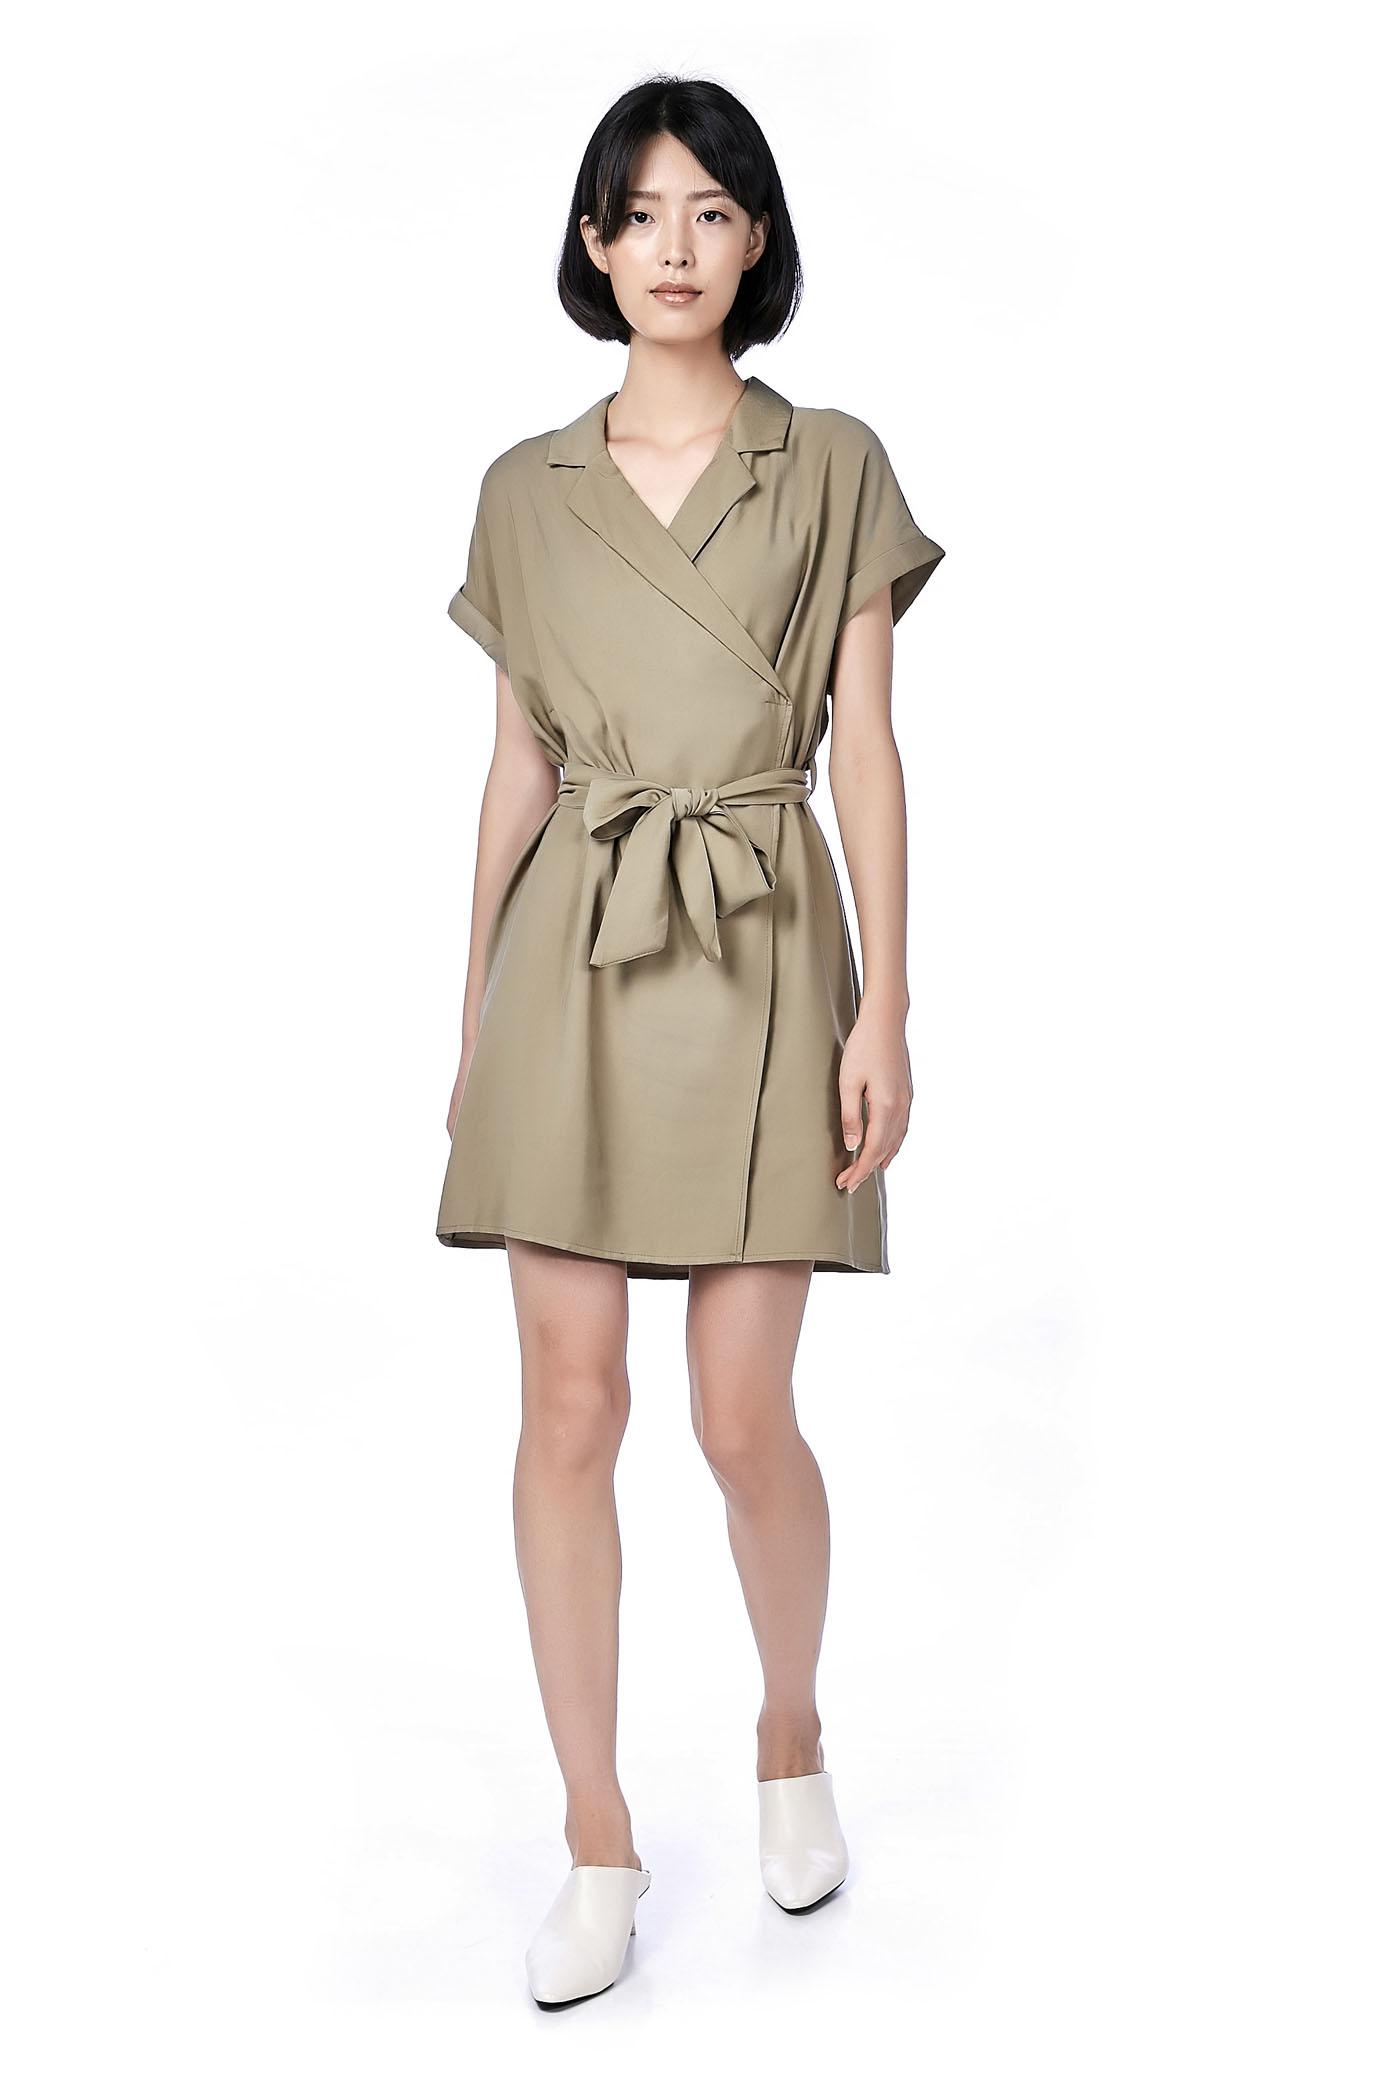 Nyssa Overlap Dress